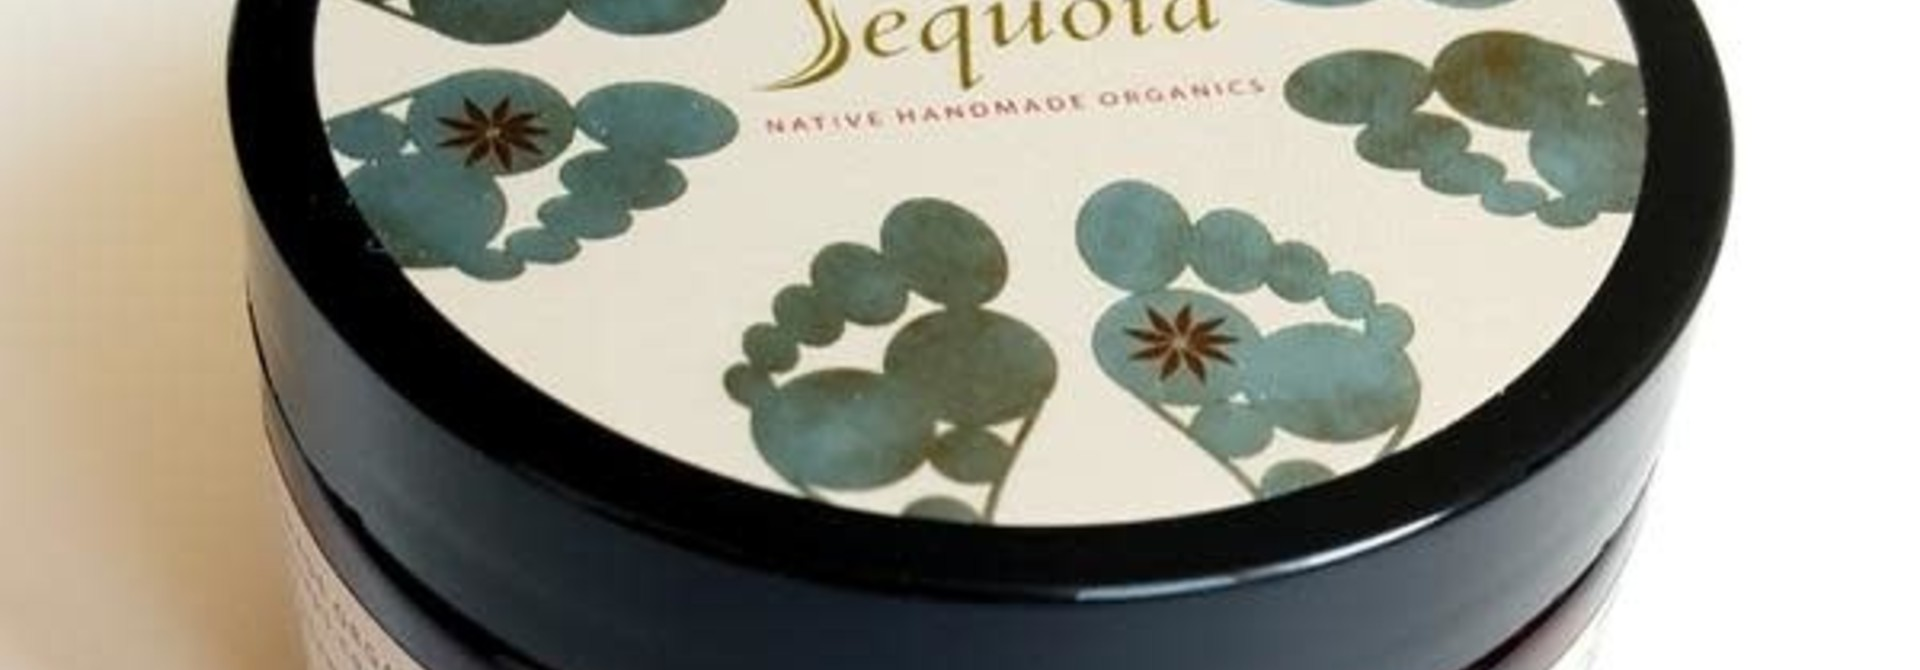 Sequoia Tea Tree Mint Foot Treatment